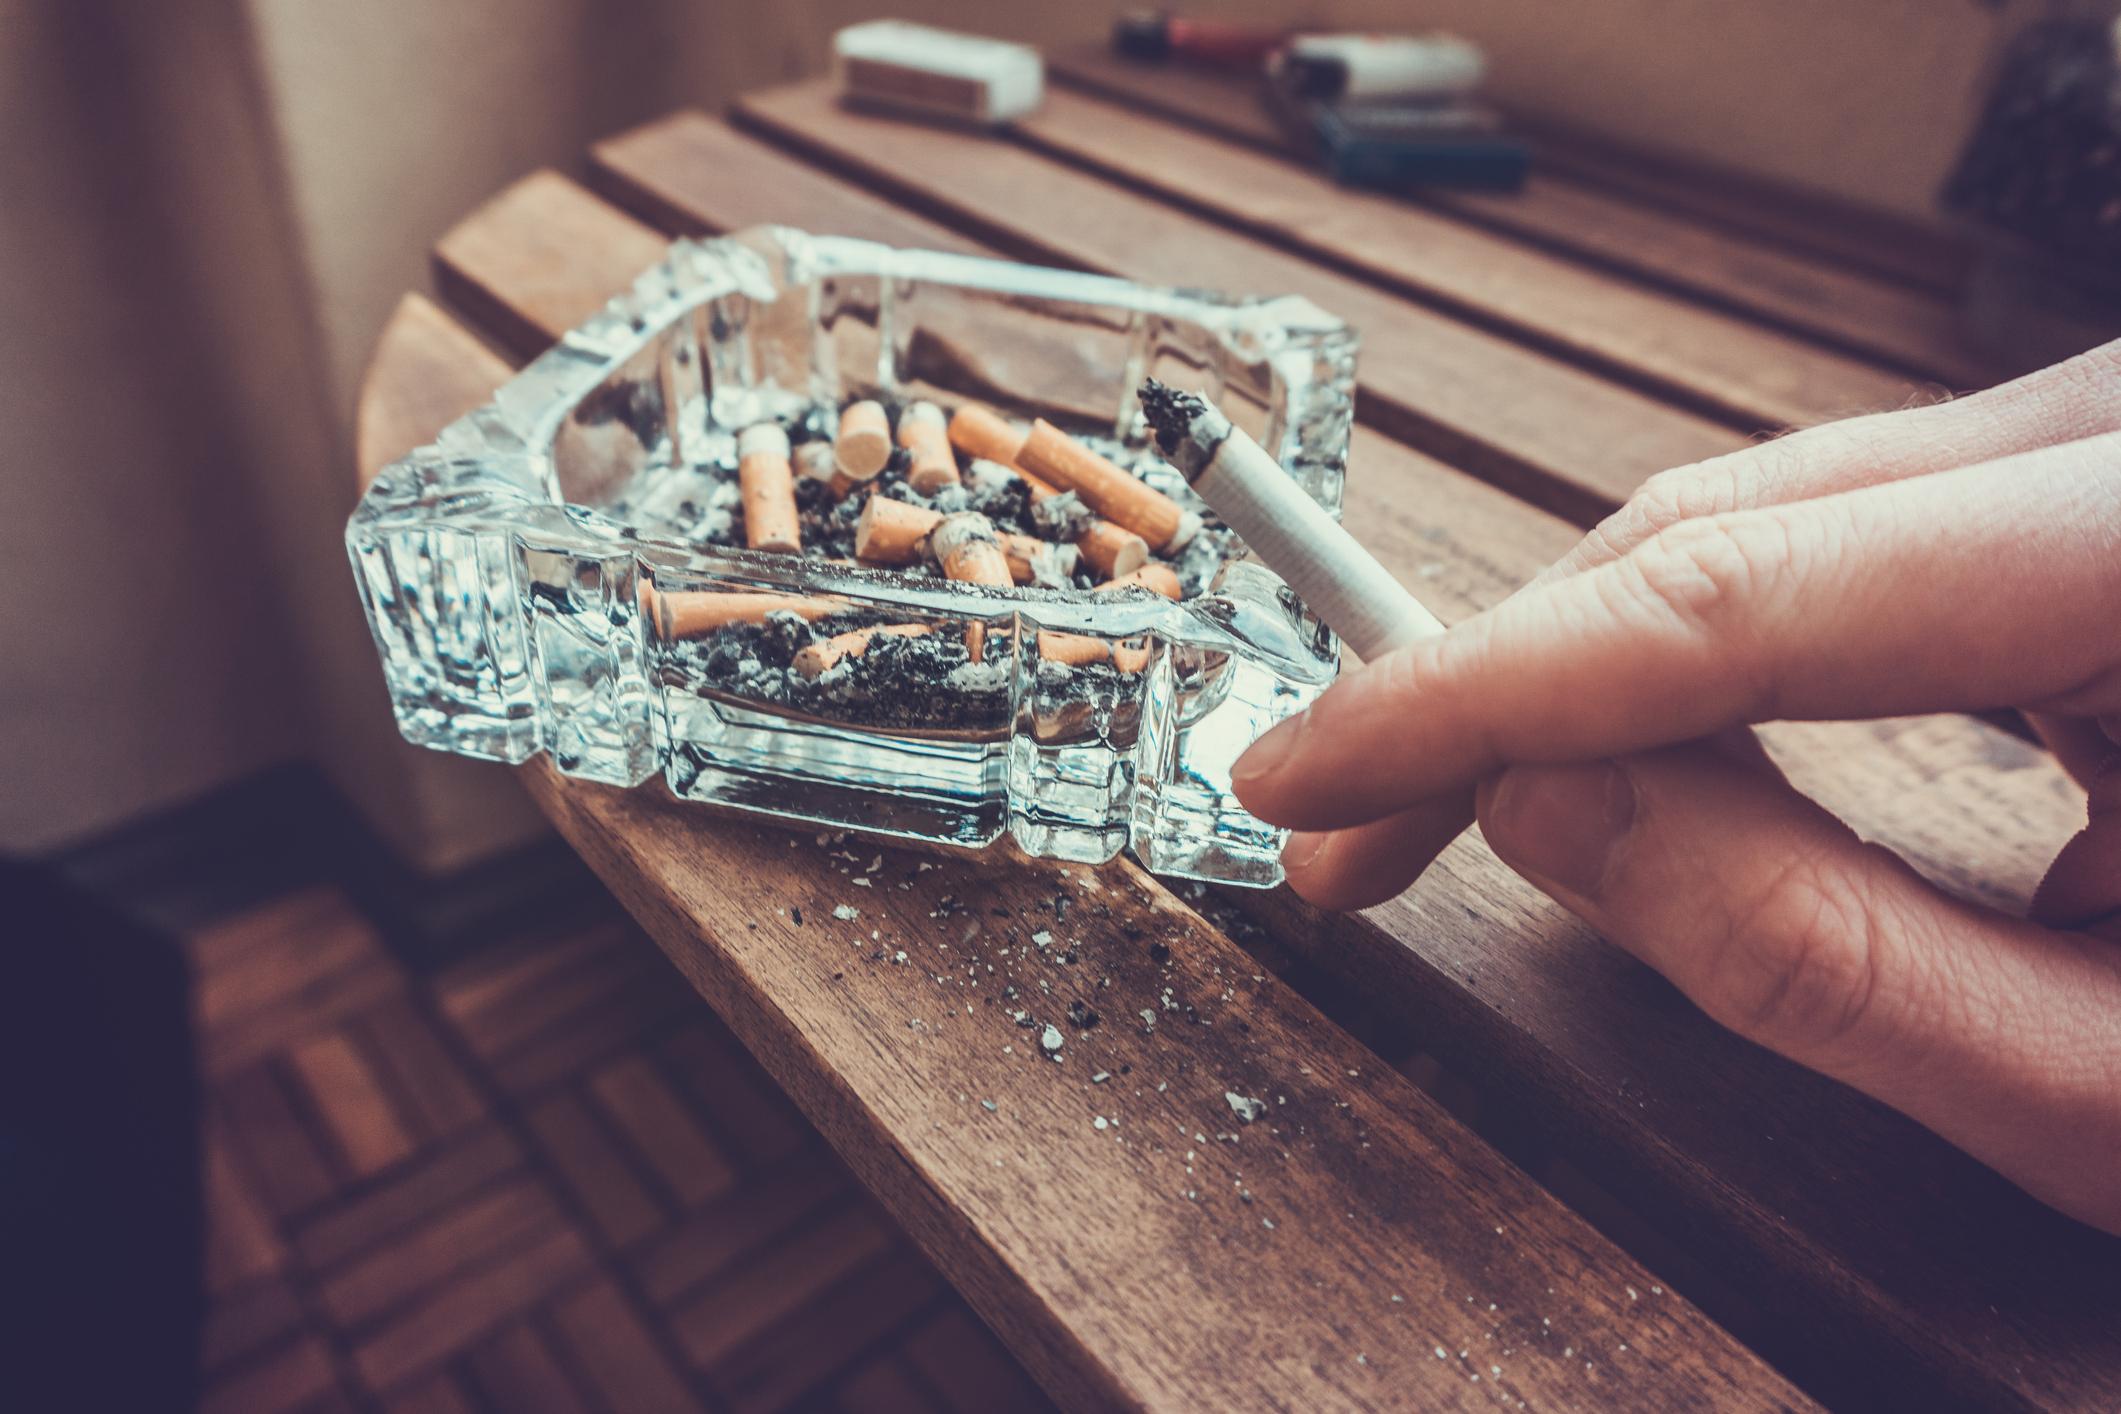 A person ashes a cigarette into an ashtray.